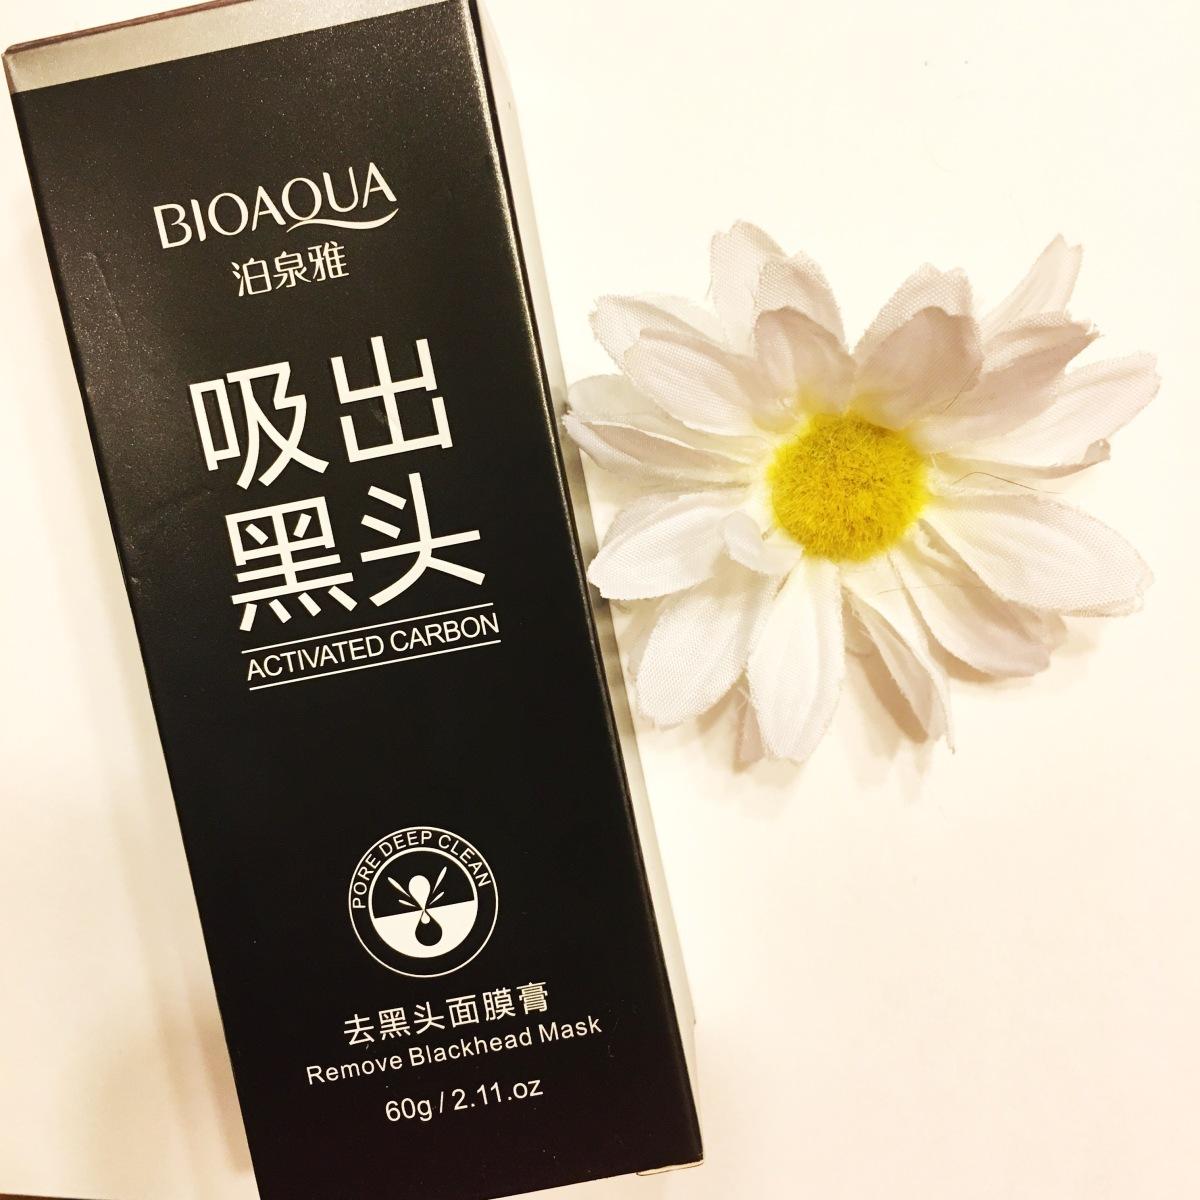 Bioaqua Blackhead Cleansing Mask Deafdaisybeauty Activated Carbon Black Charcoal